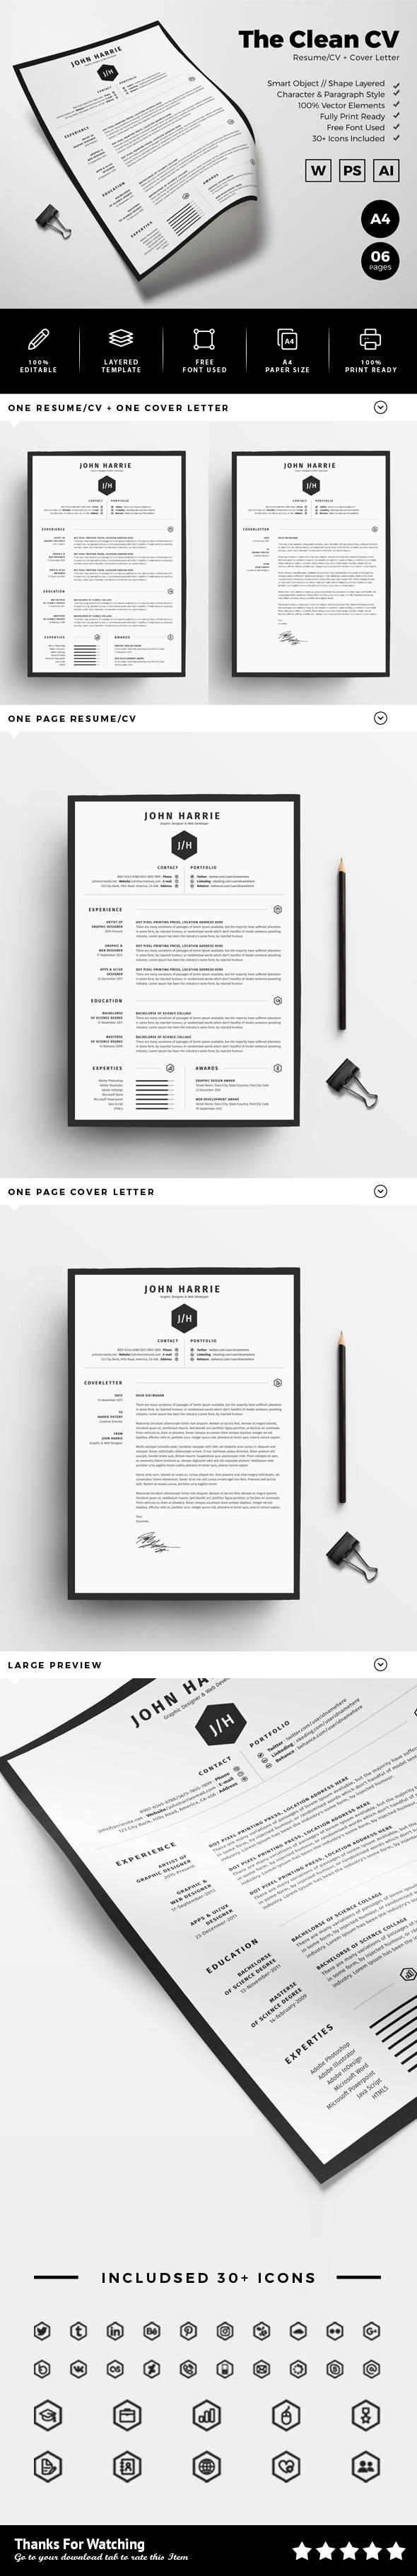 clean minimal professional creative modern infographic Resume/CV swiss elegant 02 piece